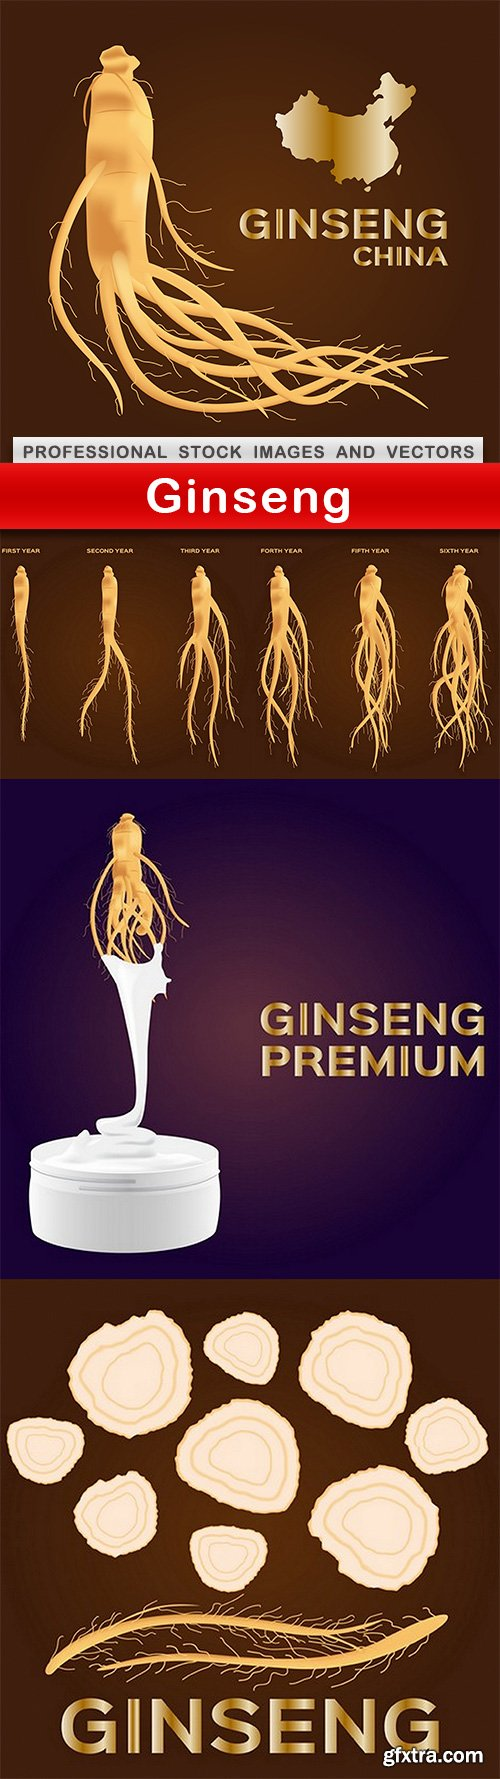 Ginseng - 5 EPS